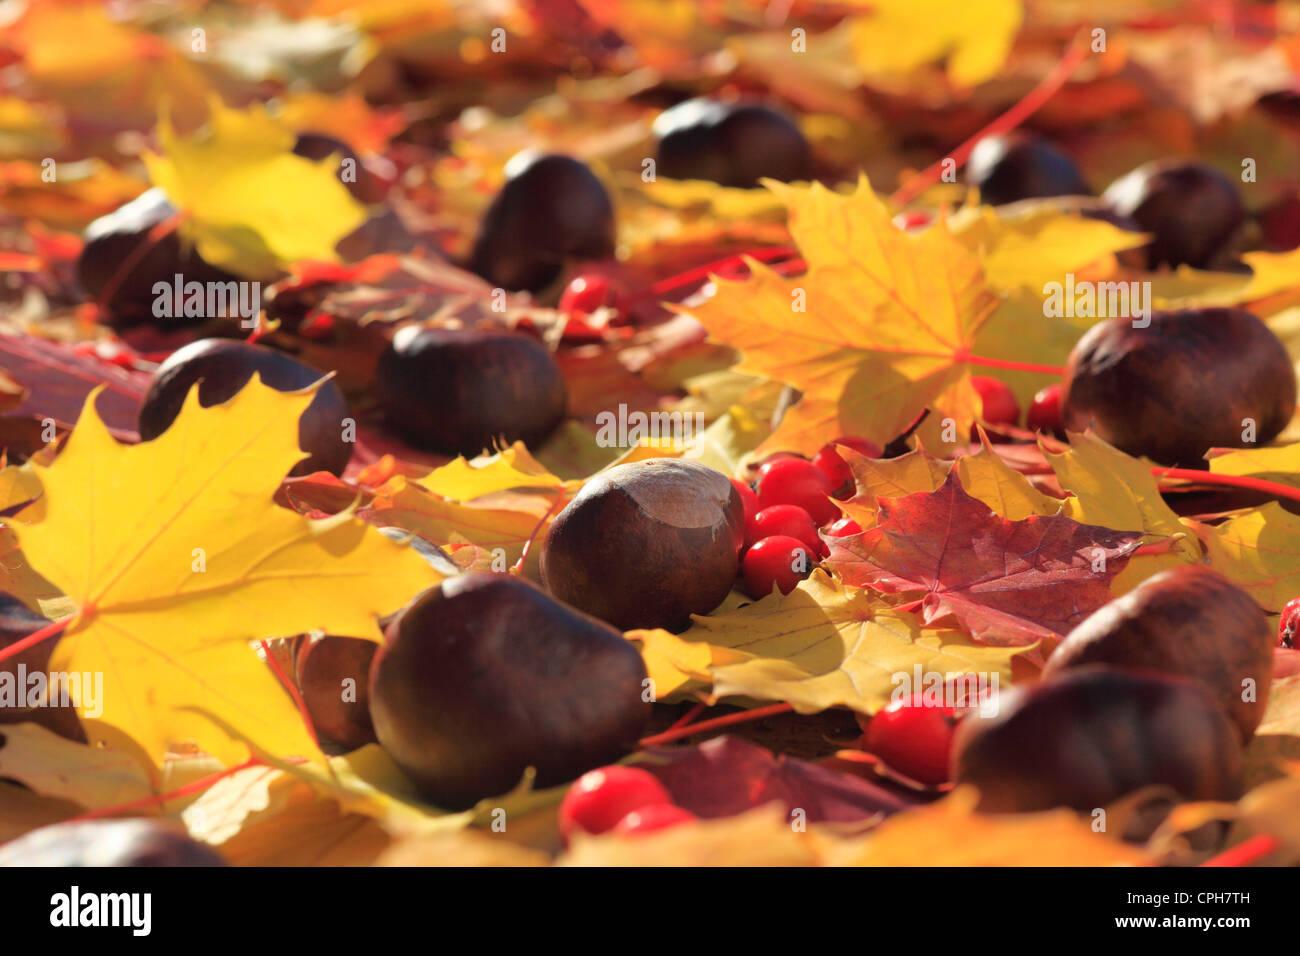 Ahorn, Beere, Beeren, Blatt, Blätter, Detail, Gegenlicht, Herbst, Herbst Farbe, Herbstfarben, Herbstlaub, Färbung, Stockbild